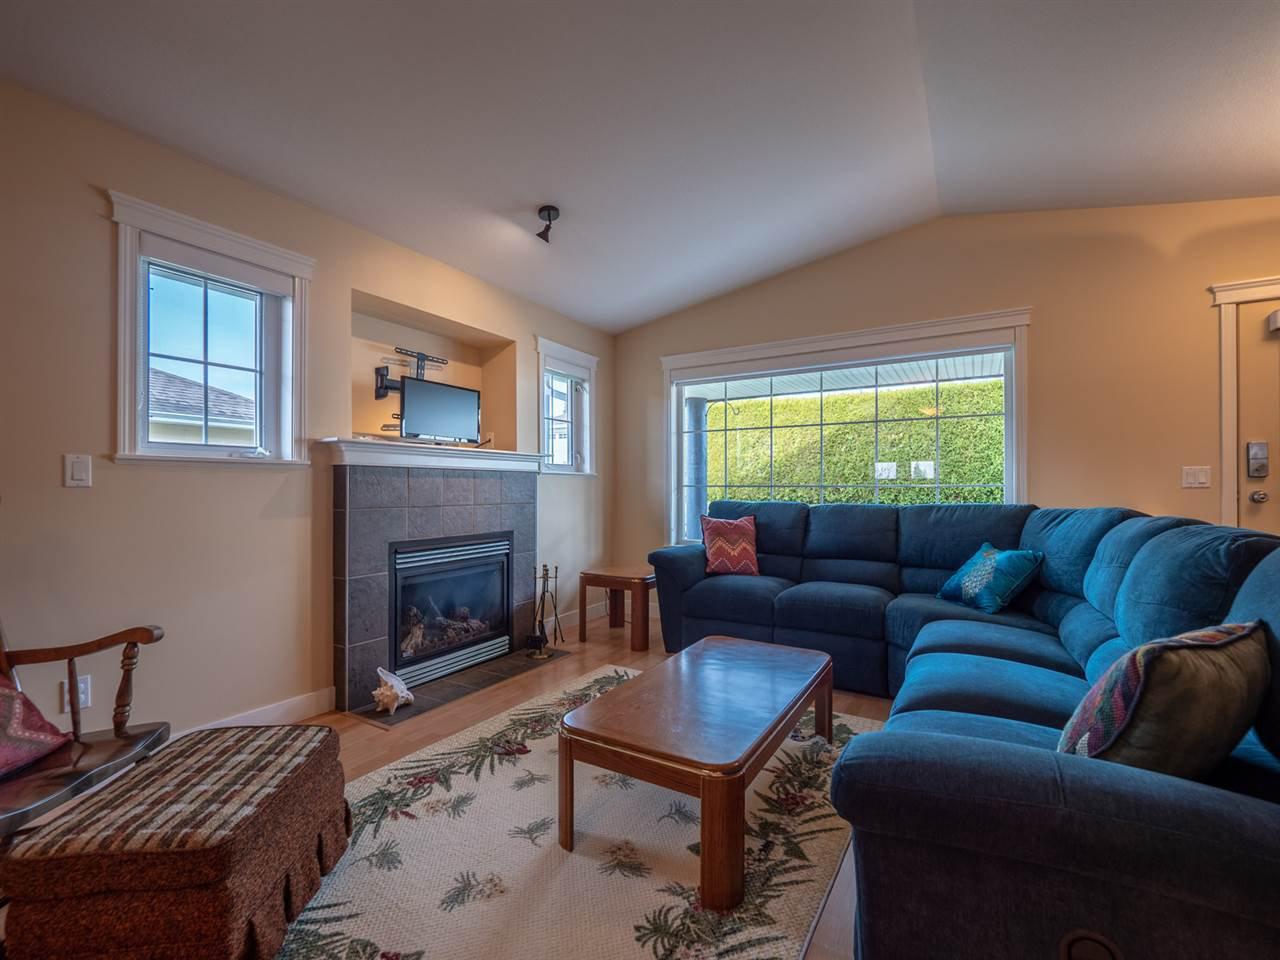 Photo 6: Photos: 5708 EMILY Way in Sechelt: Sechelt District House for sale (Sunshine Coast)  : MLS®# R2328606